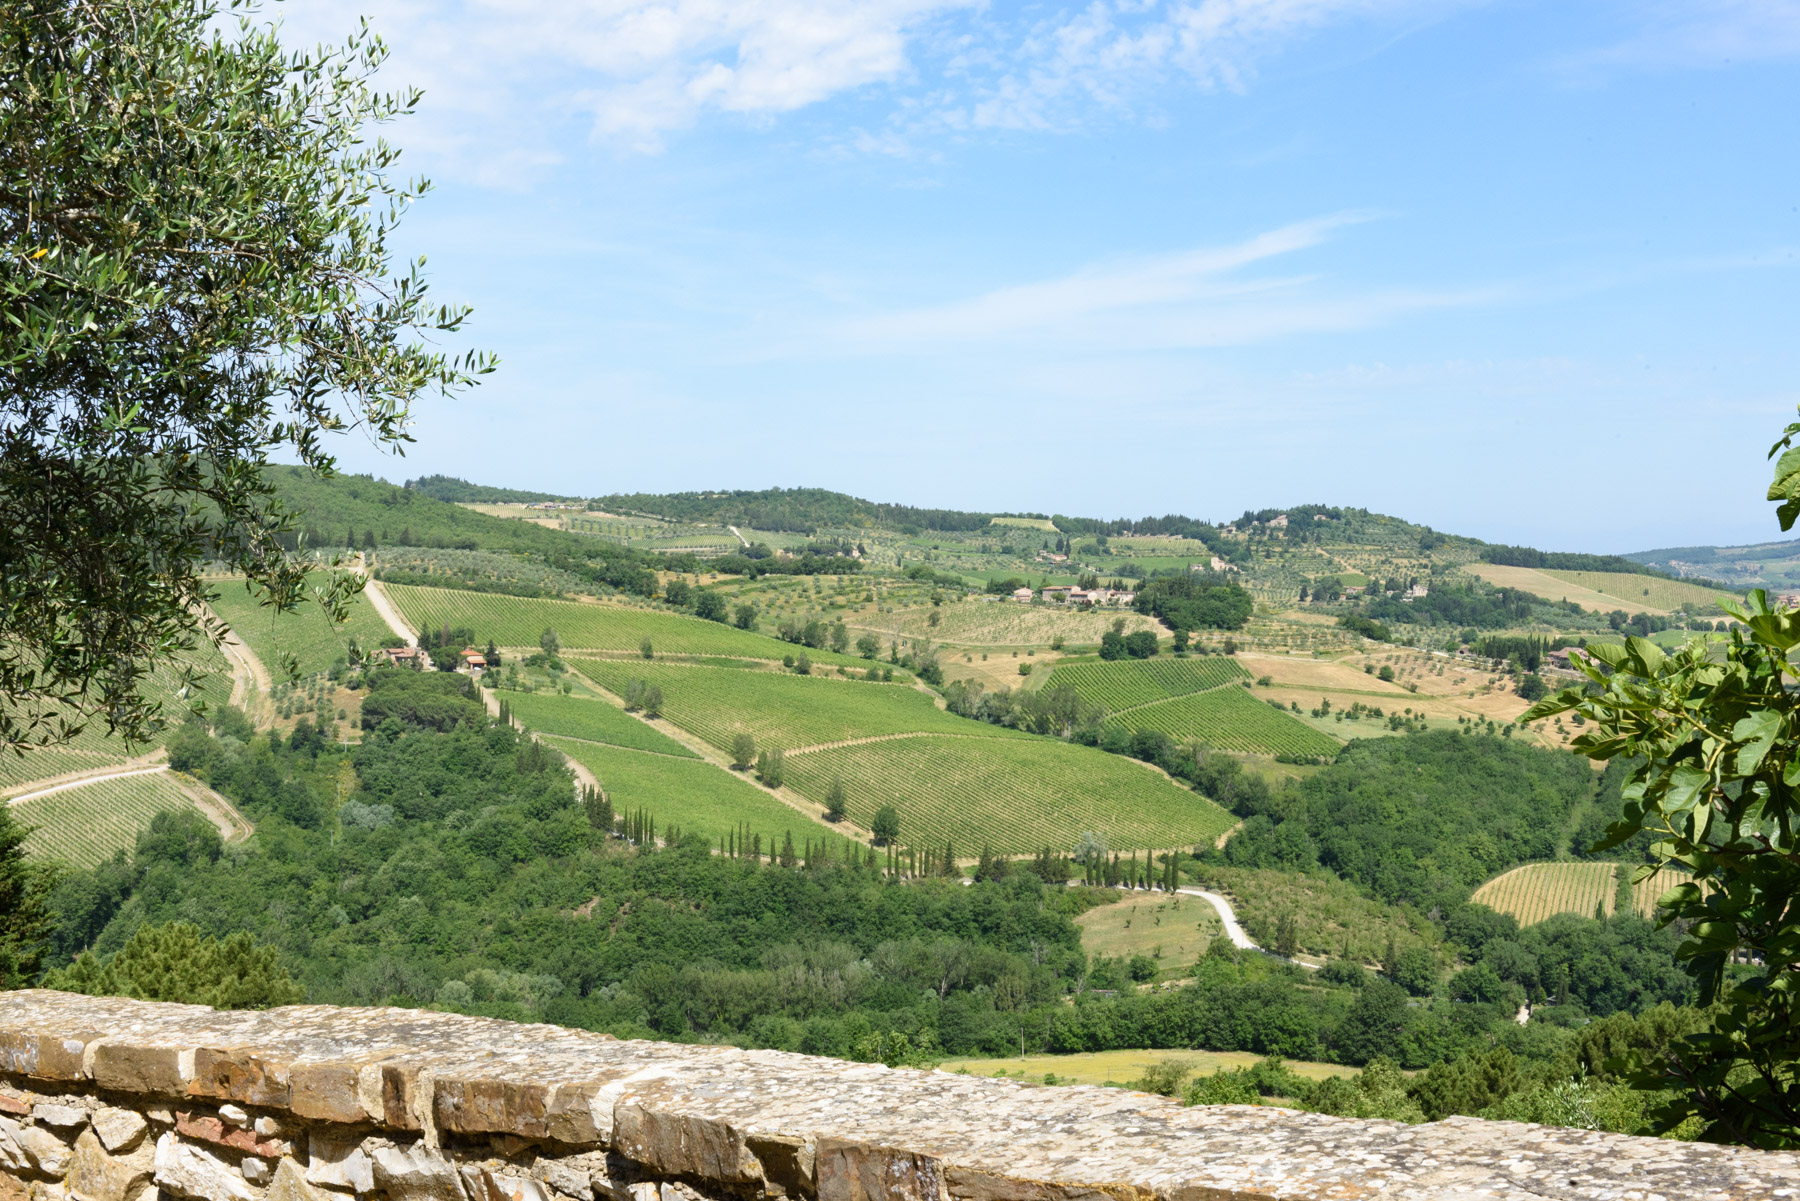 Rustico in Vendita a Castellina In Chianti: 5 locali, 650 mq - Foto 21